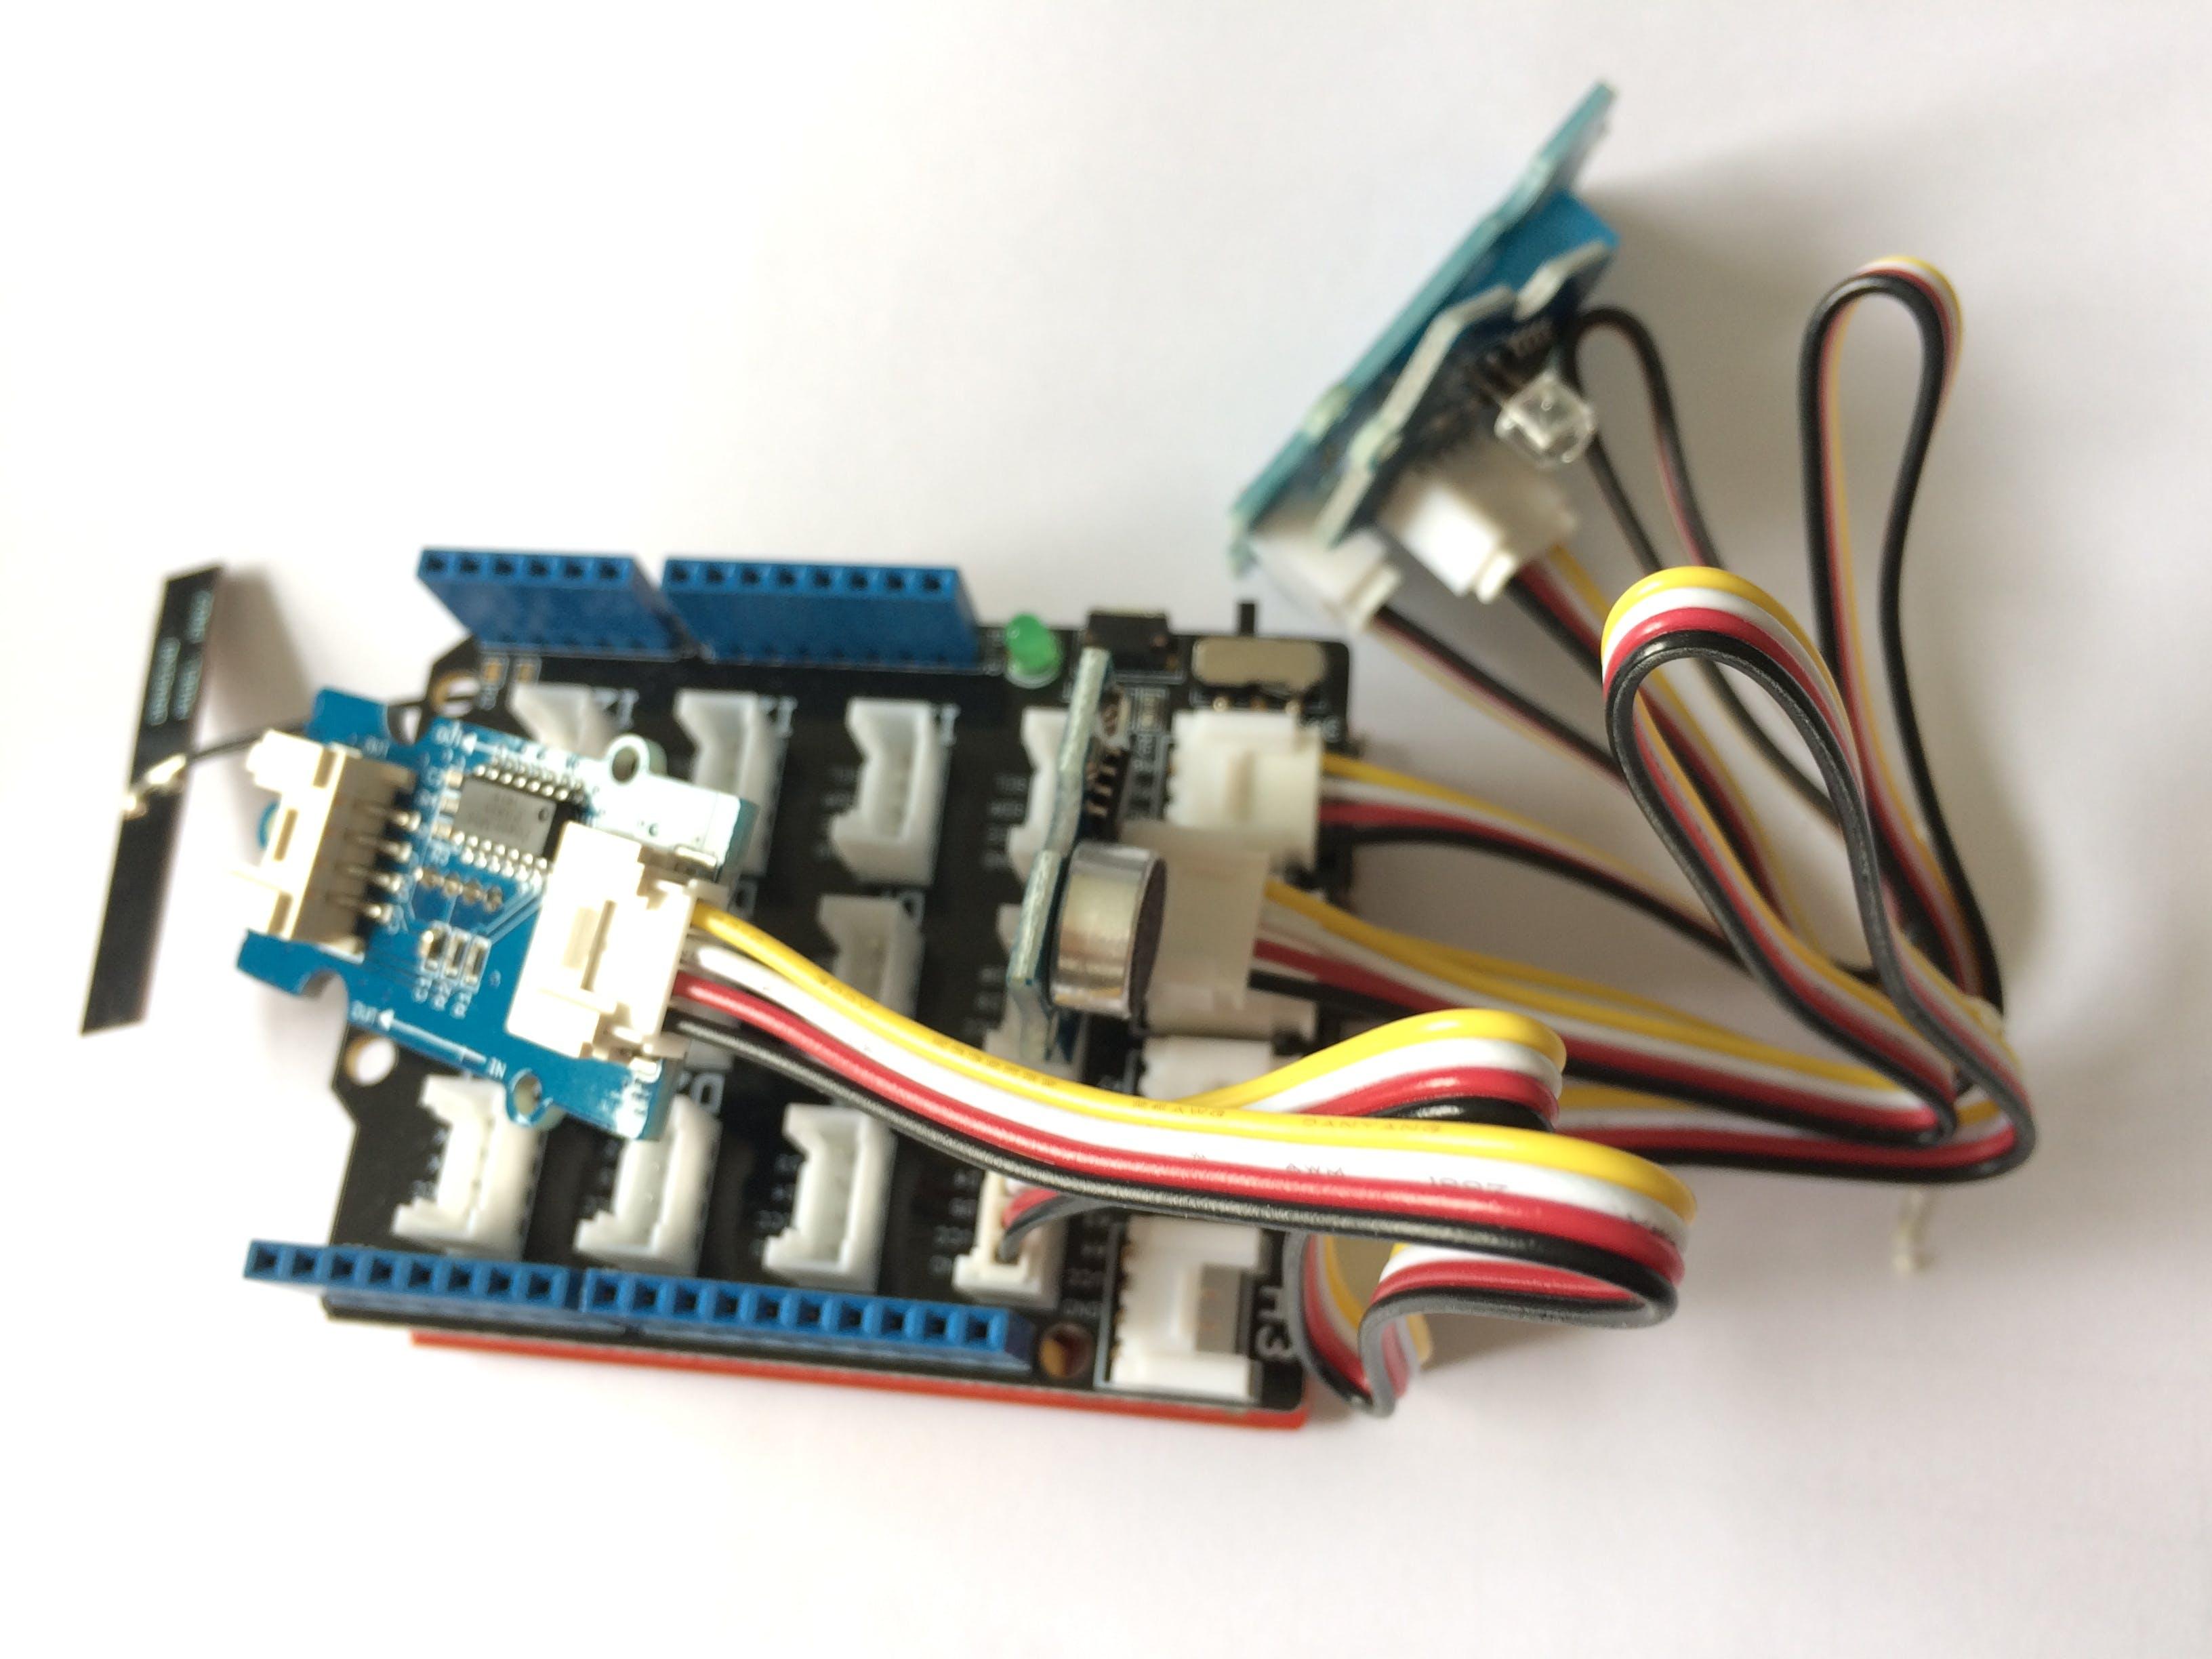 Figure 2. SeeeduinoCloud with sensors